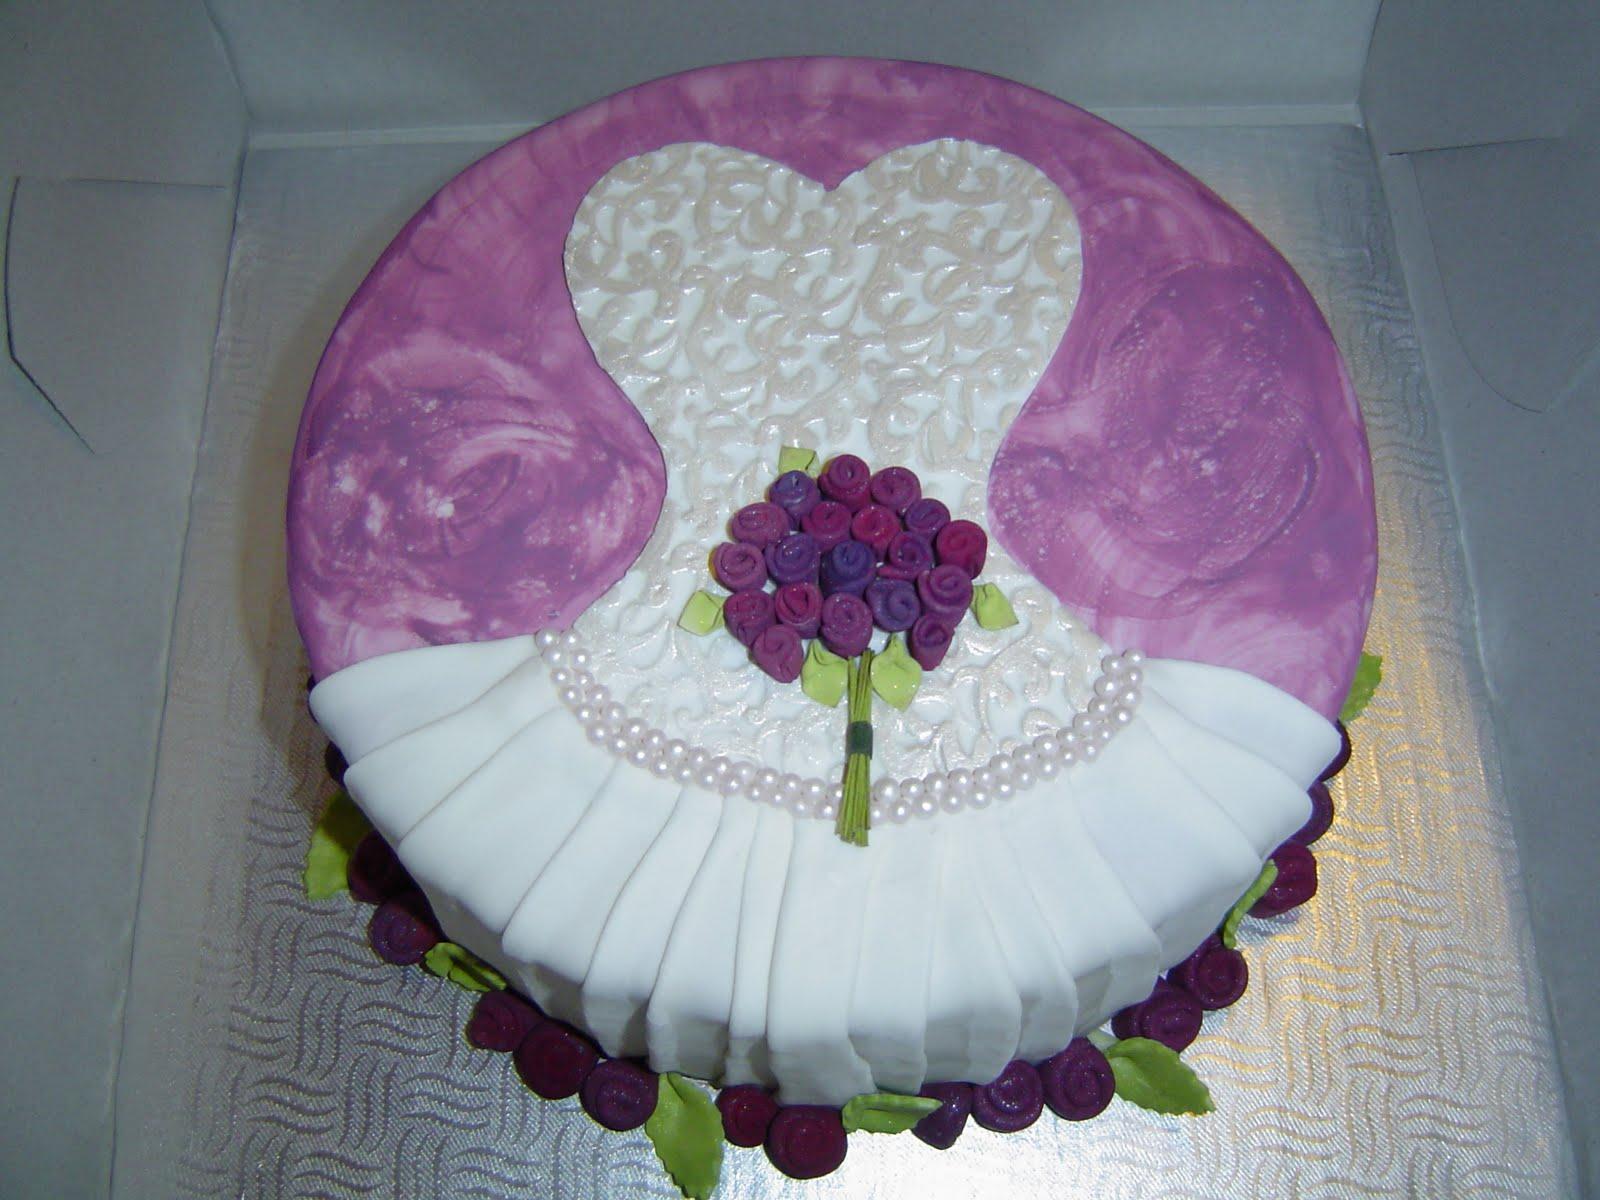 10 Pretty Bridal Shower Cakes Designs Ideas CAKE DESIGN AND DECORATING IDEAS